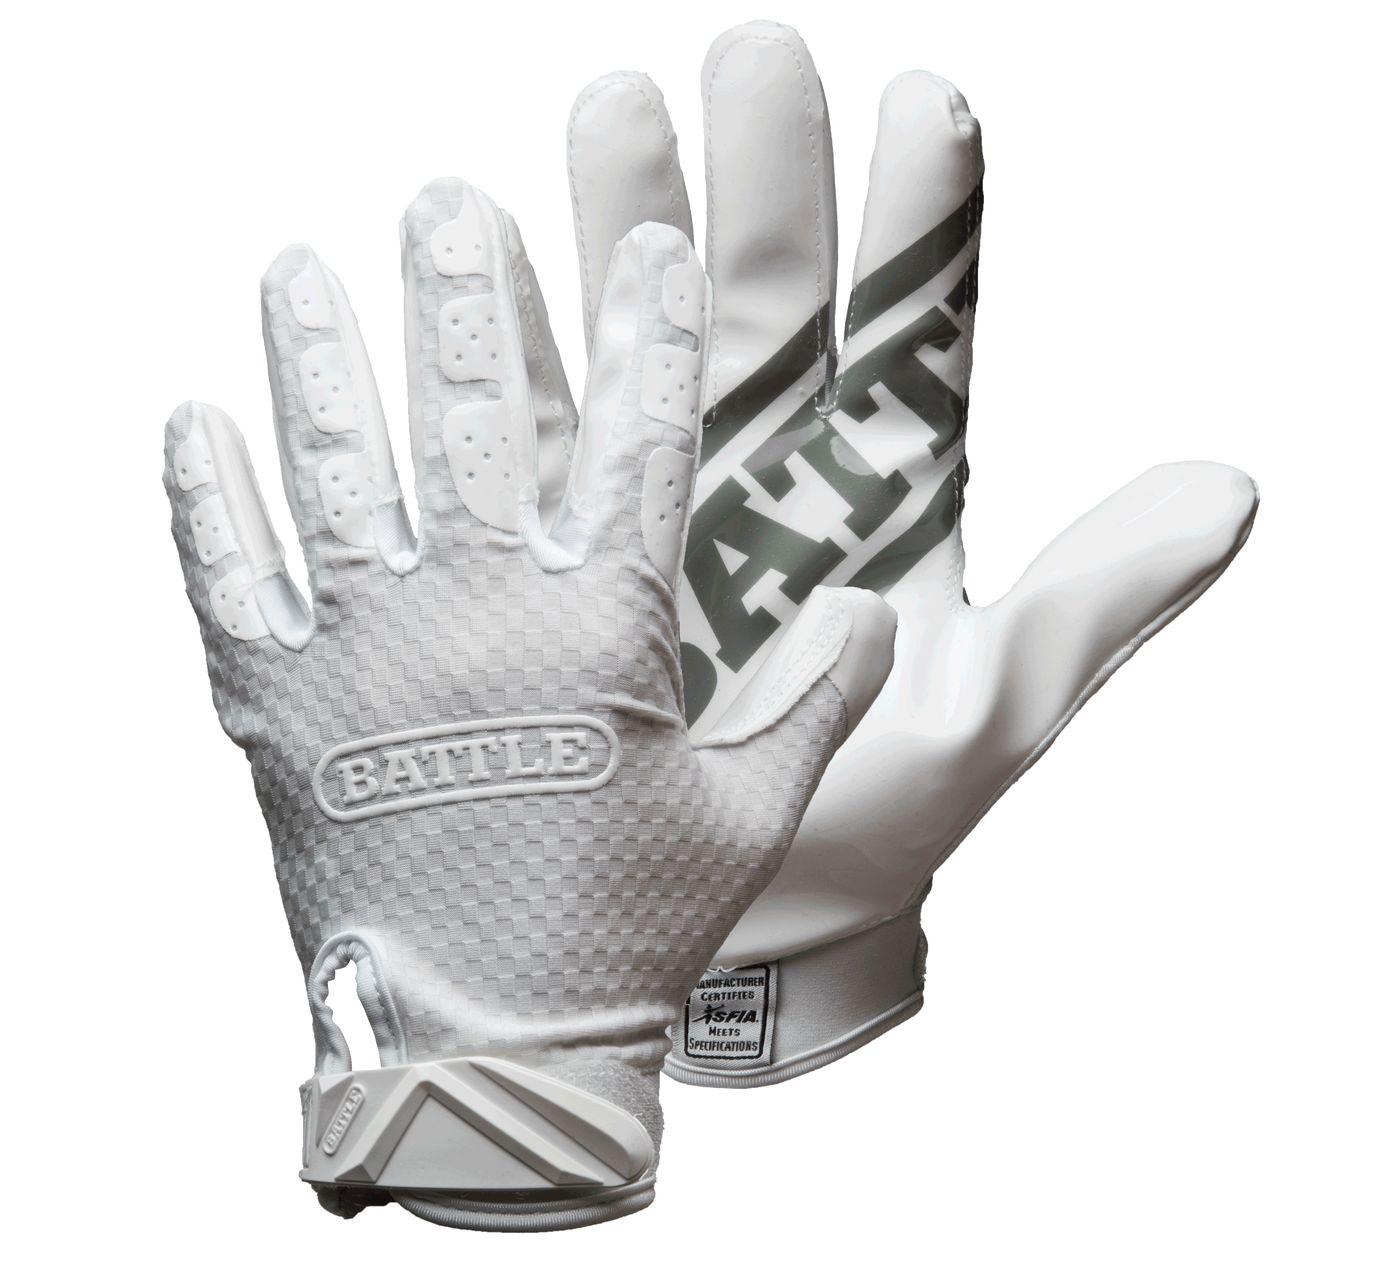 Battle Adult Triple Threat Receiver Gloves 2019